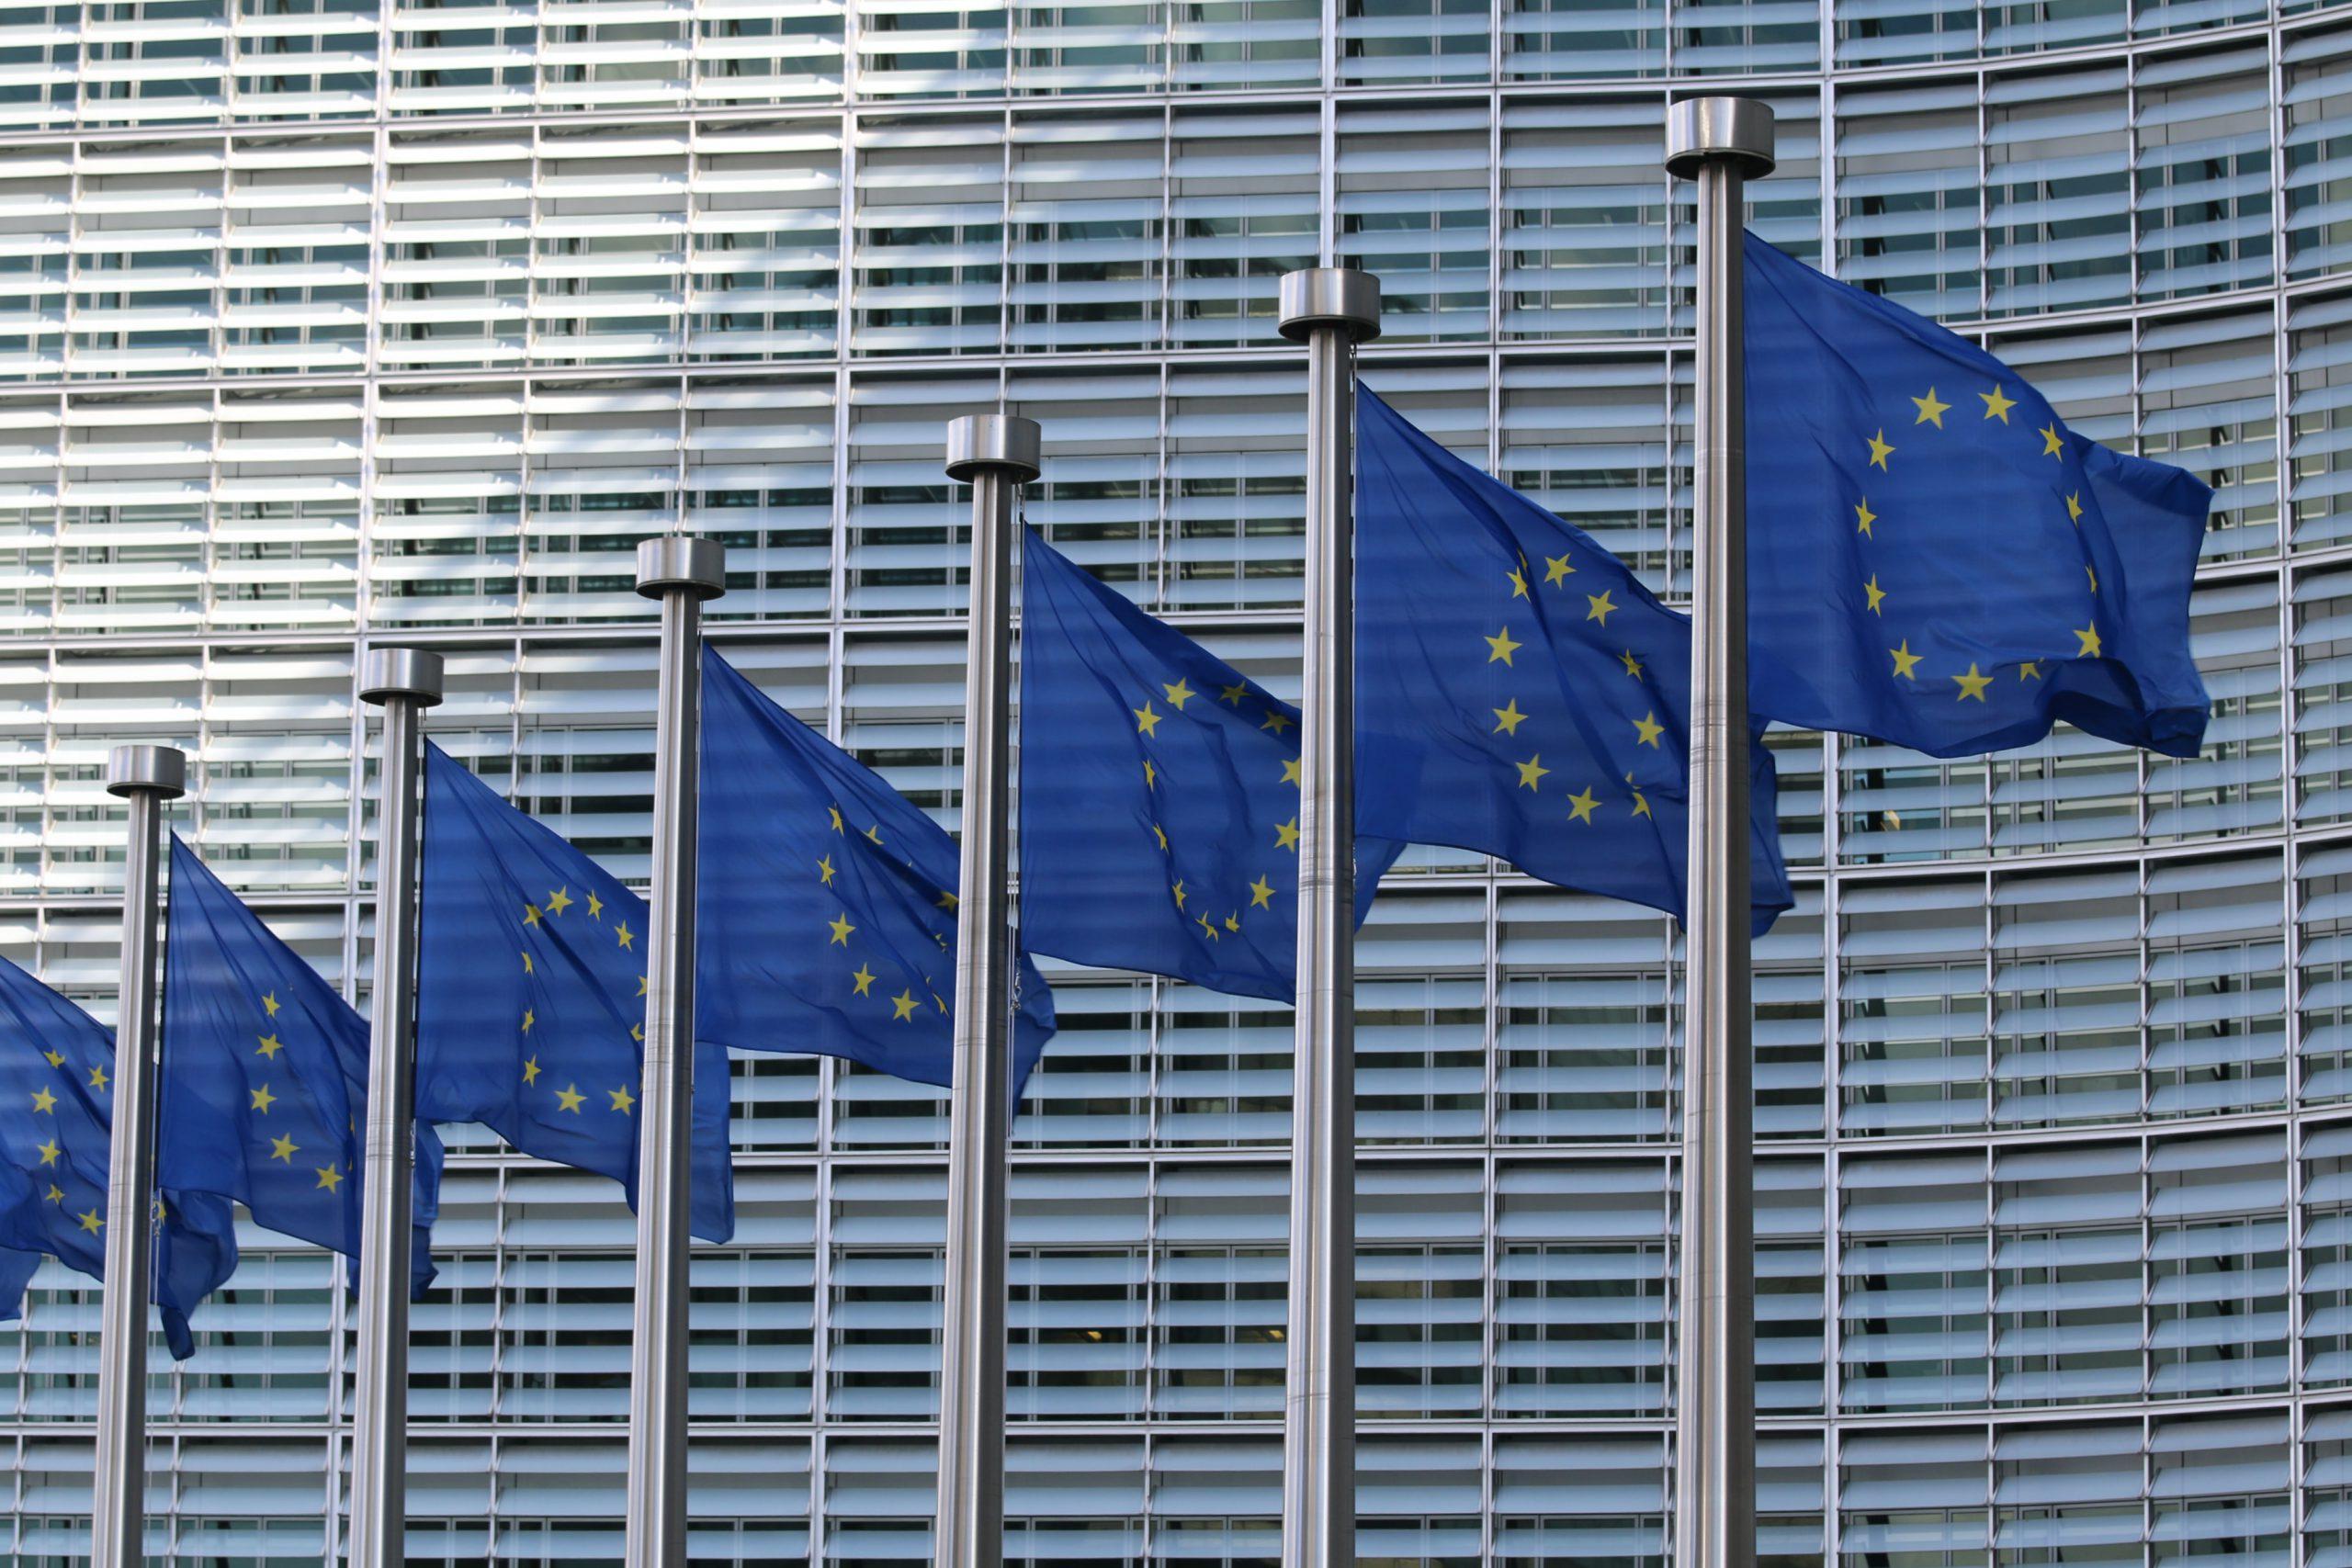 eu-flags-at-the-european-commission-berlaymont-building-stockpack-unsplash.jpg